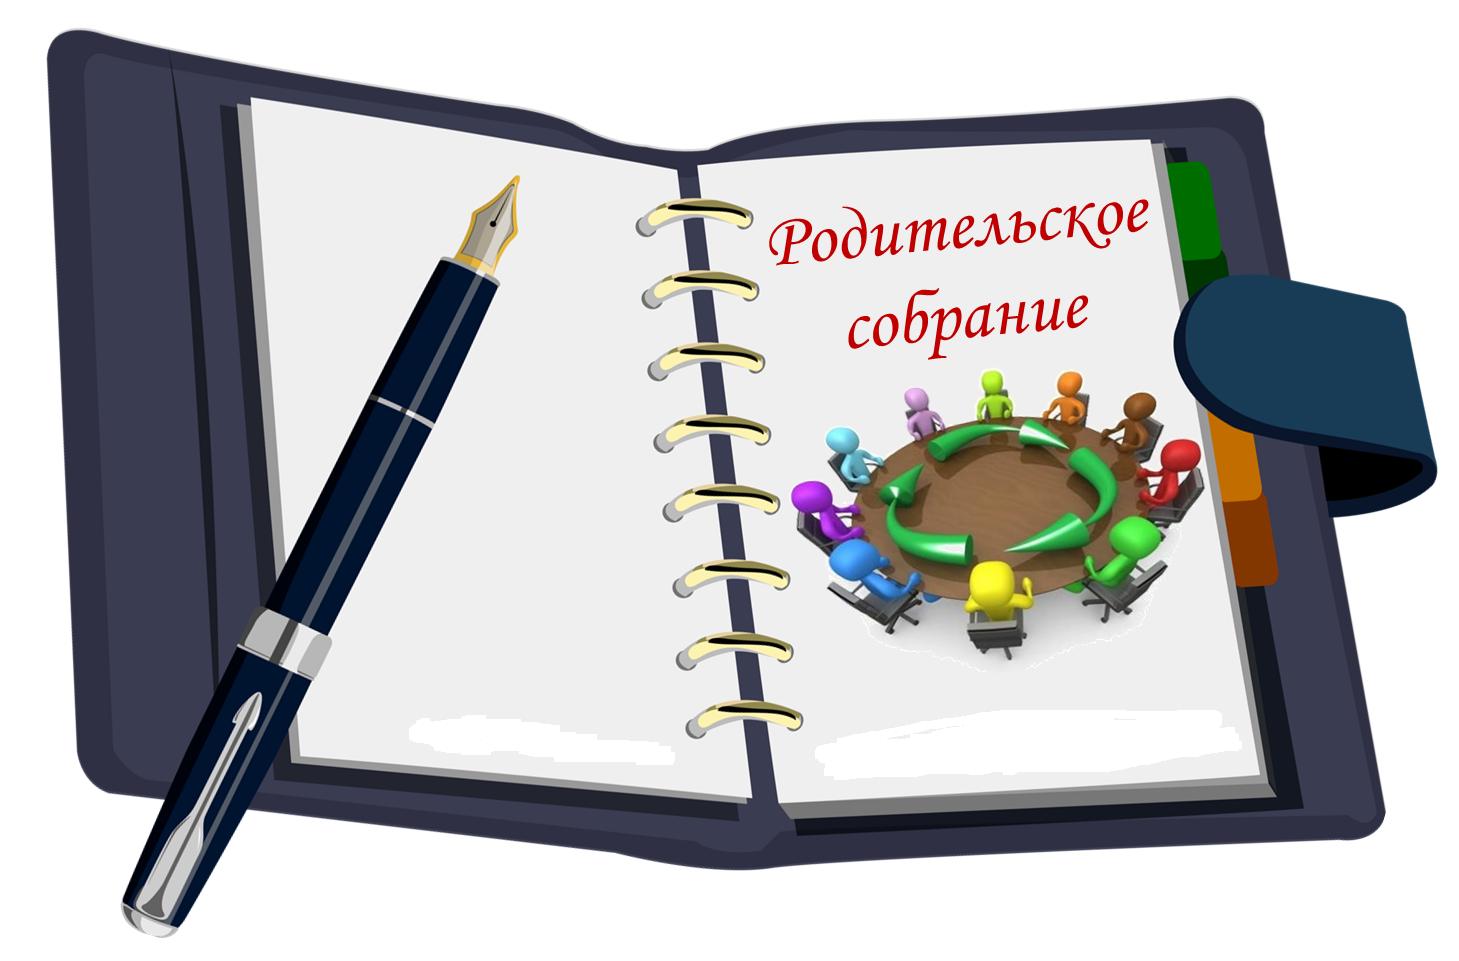 http://gimnazia-1.3dn.ru/js/roditelskoe_sobranie.png